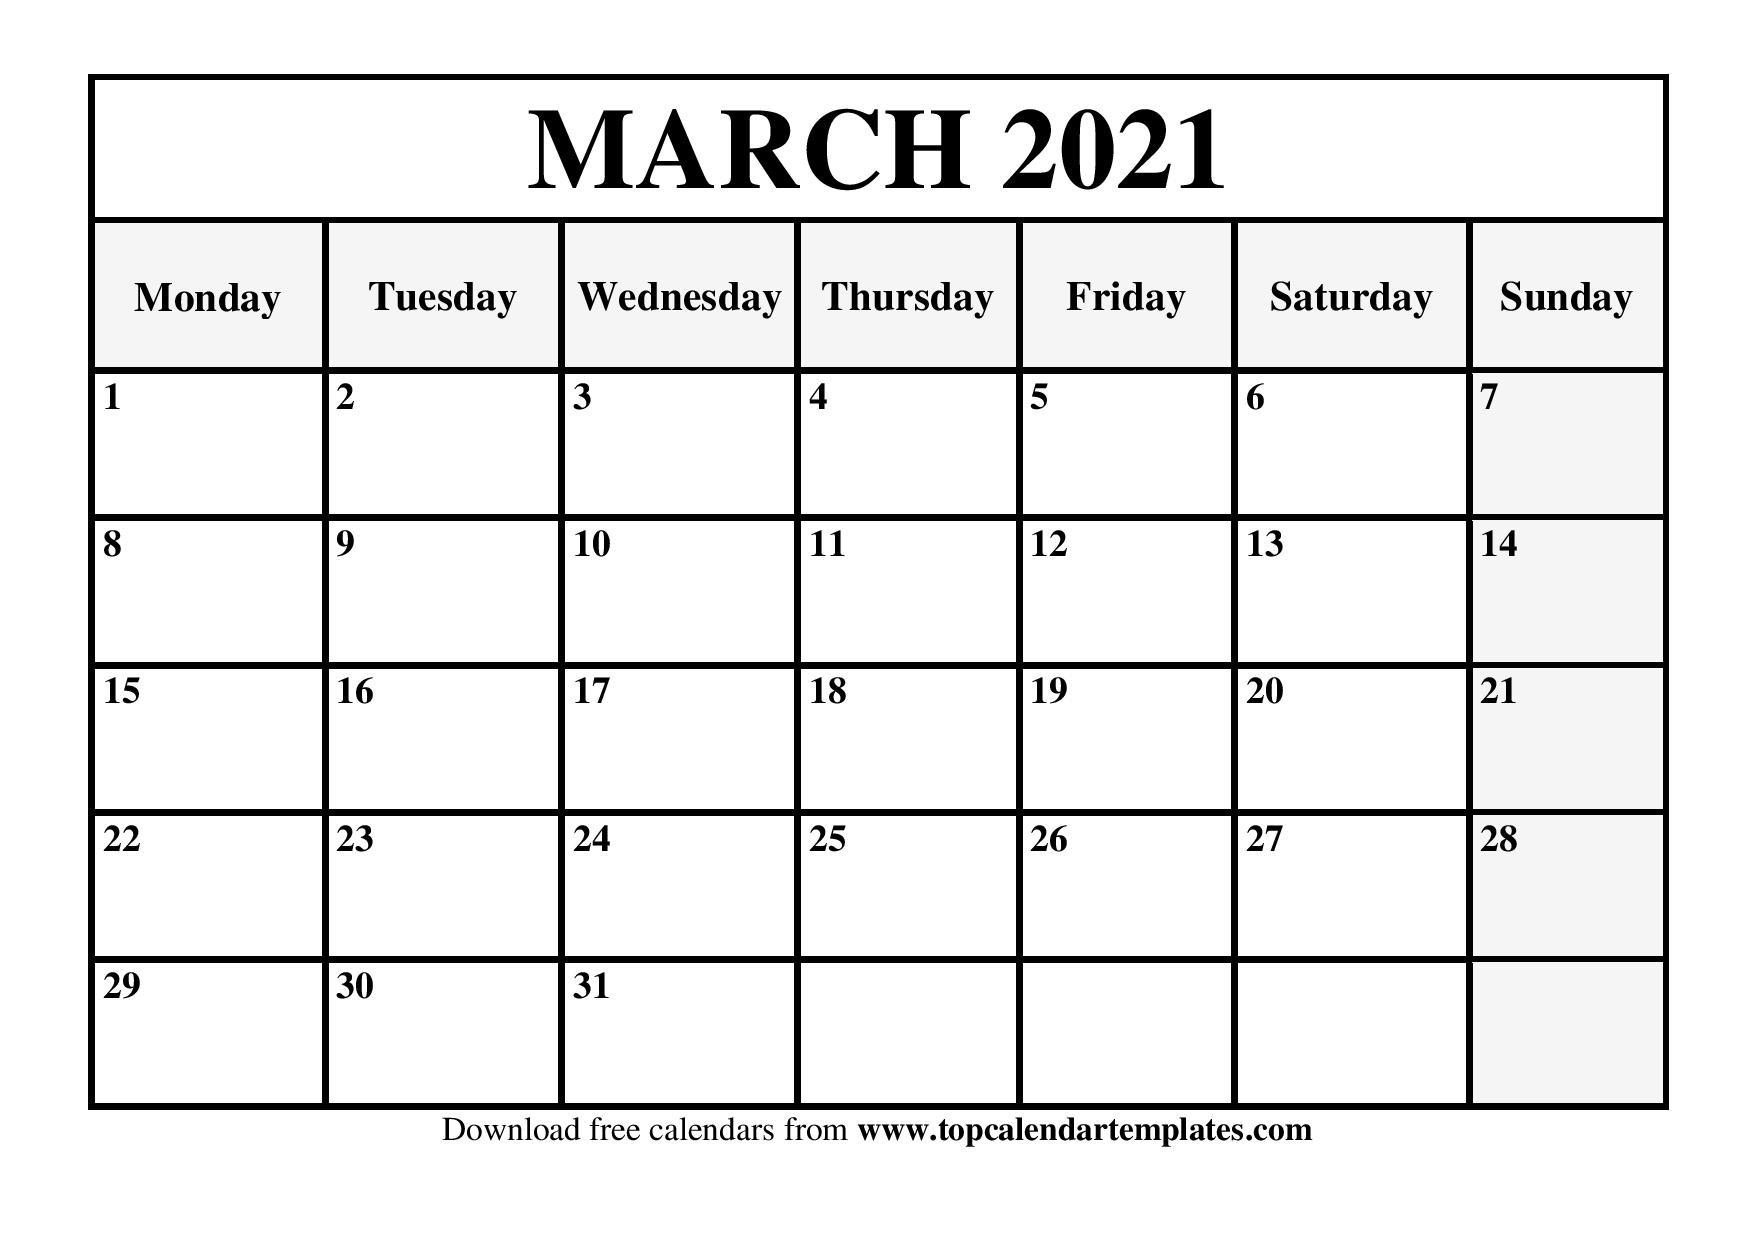 Free March 2021 Calendar Printable Blank Templates